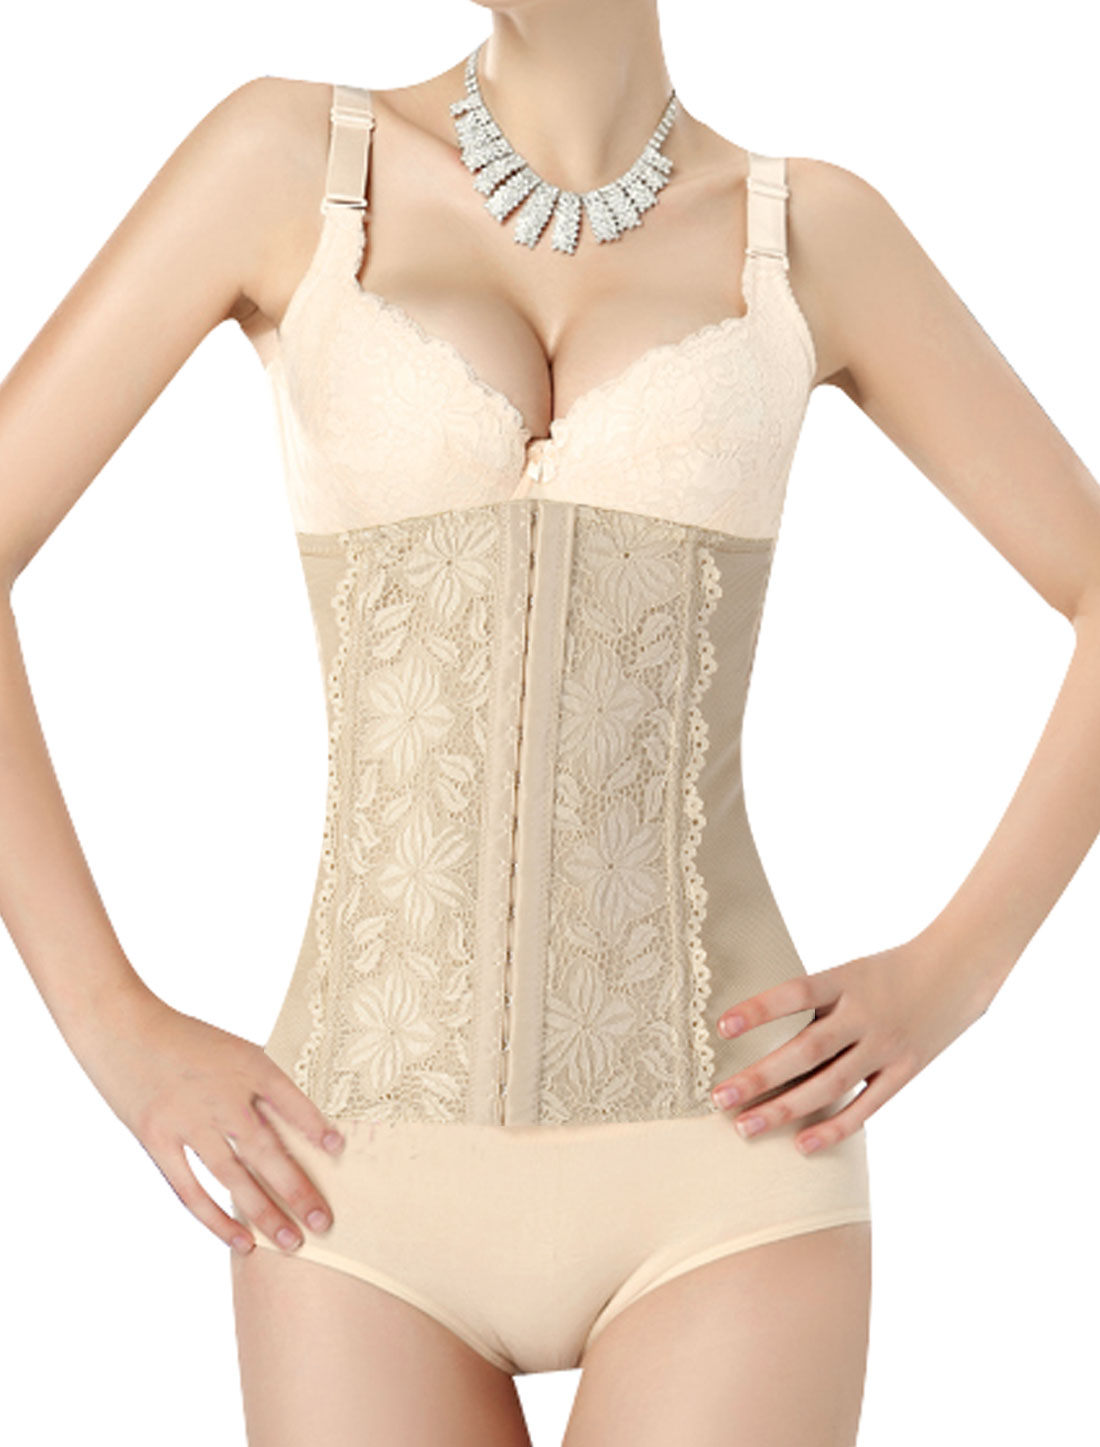 L Flesh Color Waist Tummy Belt Body Shaper Adjustable Corset Cincher for Ladies